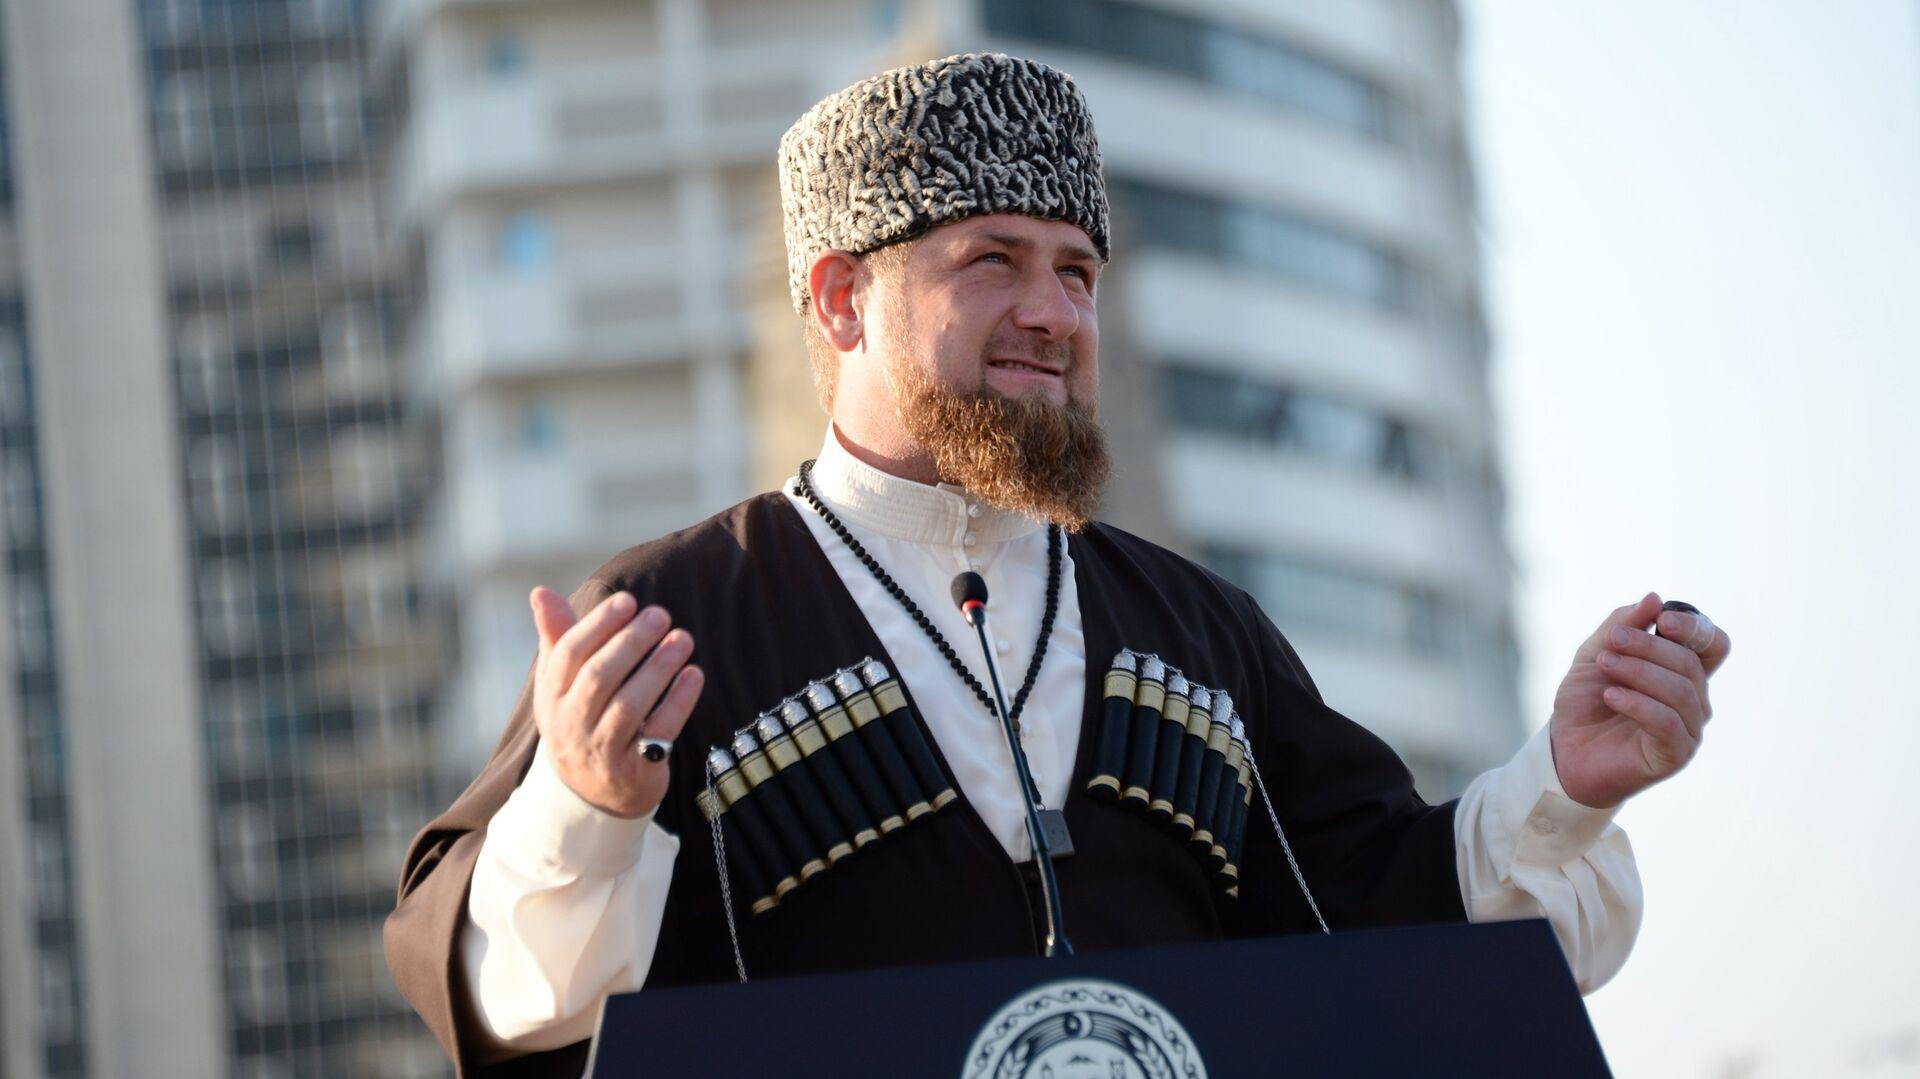 Биография Рамзана Кадырова